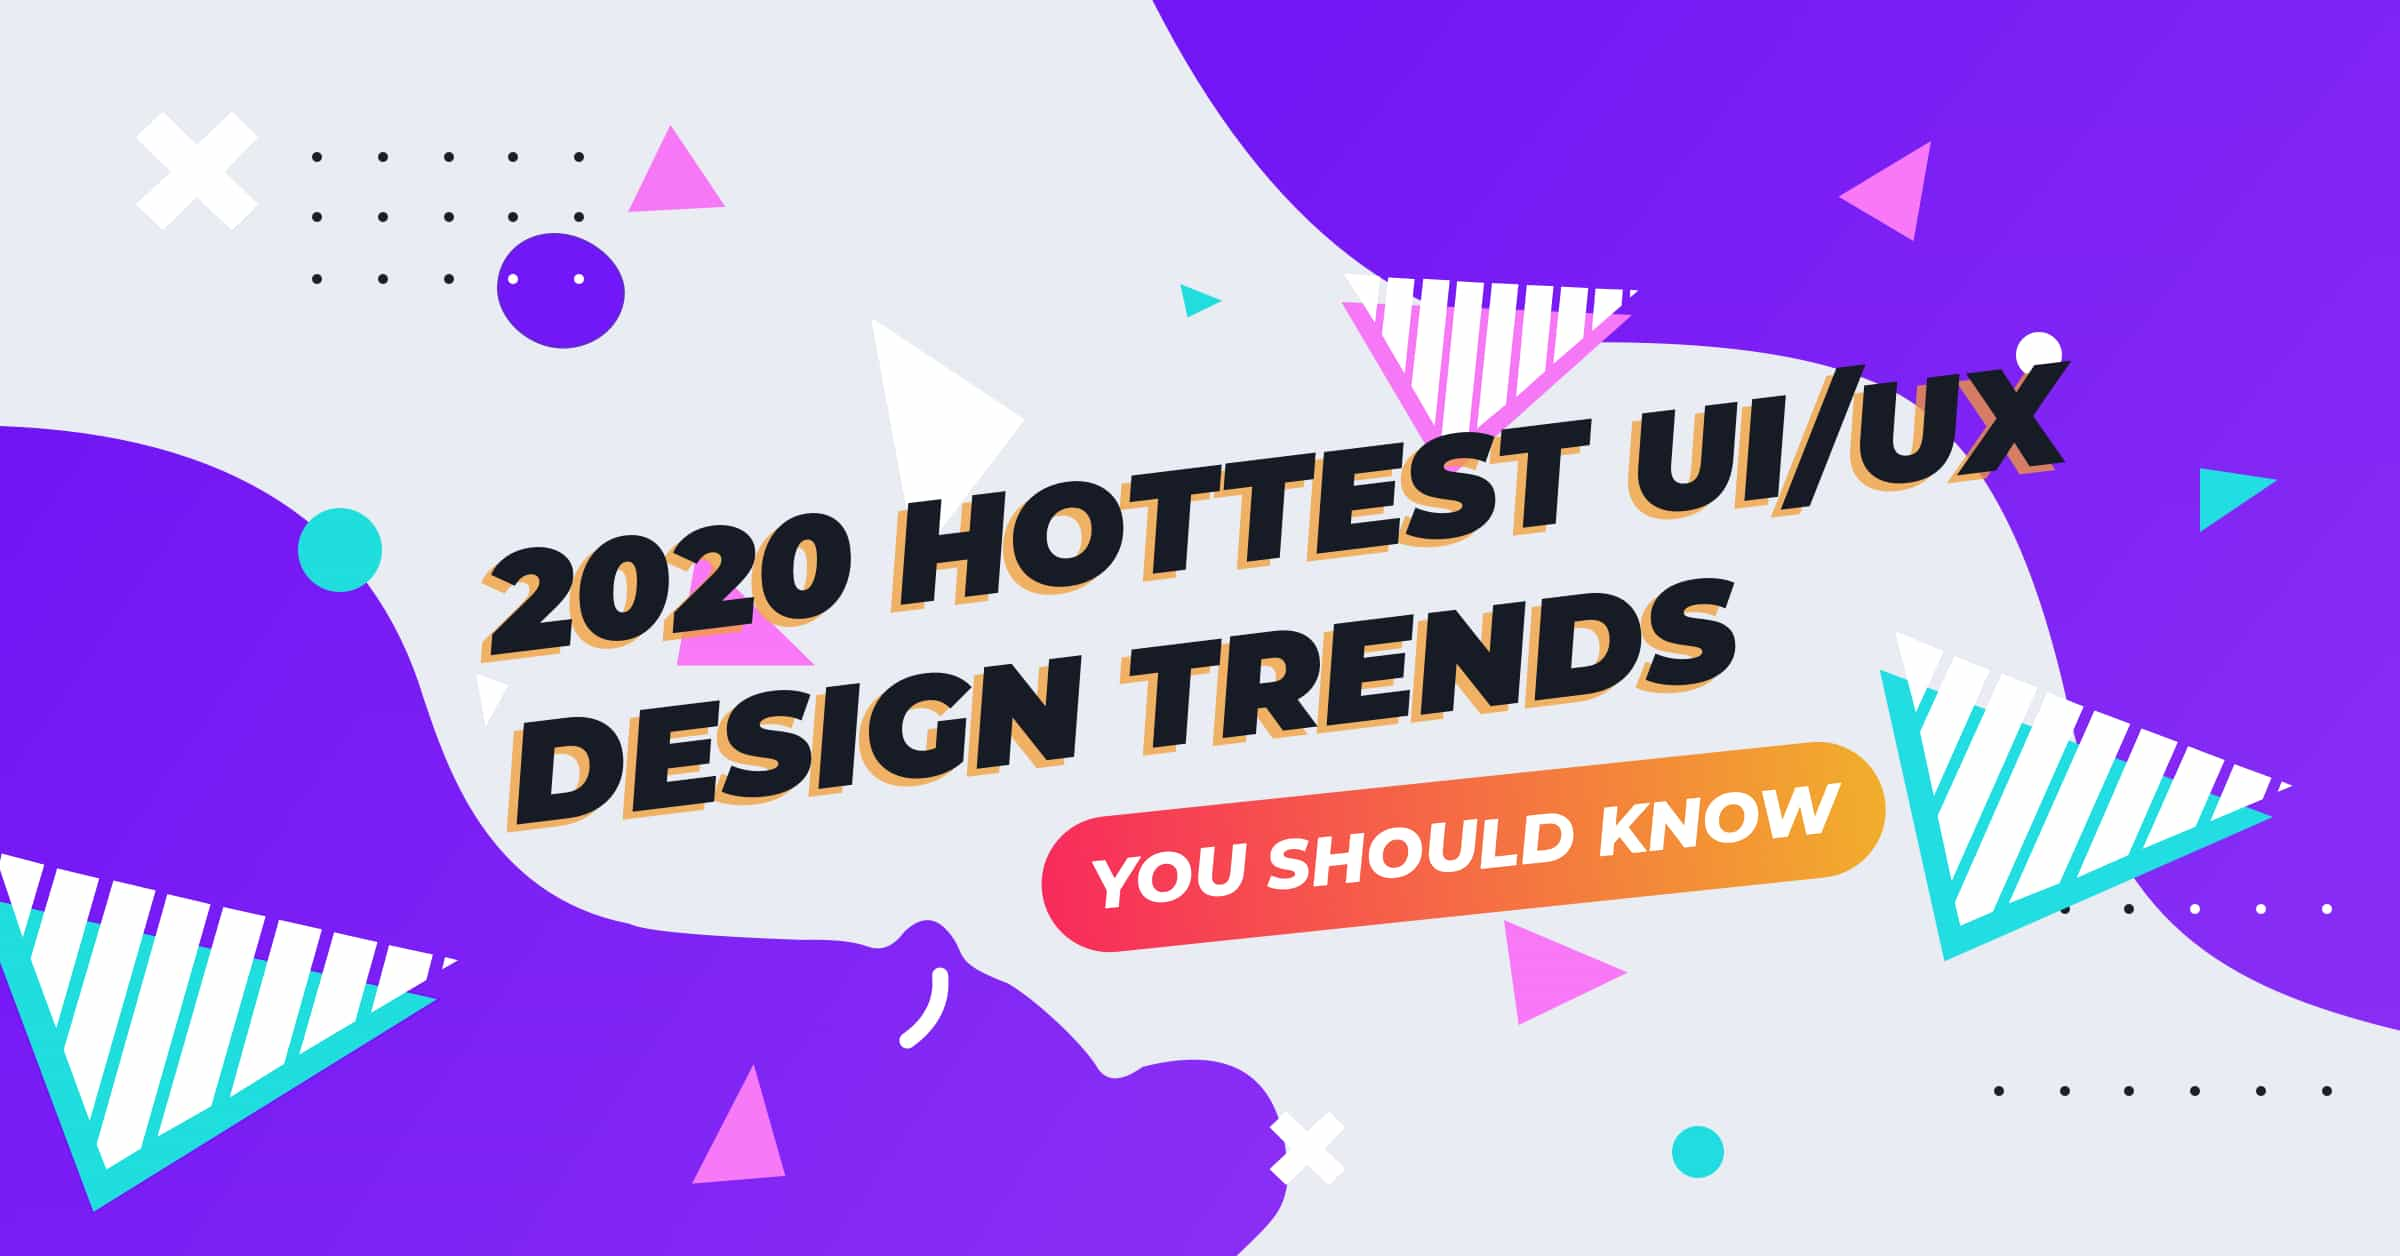 Ui Design Trends 2020.2020 Hottest Ui Ux Design Trends You Should Know